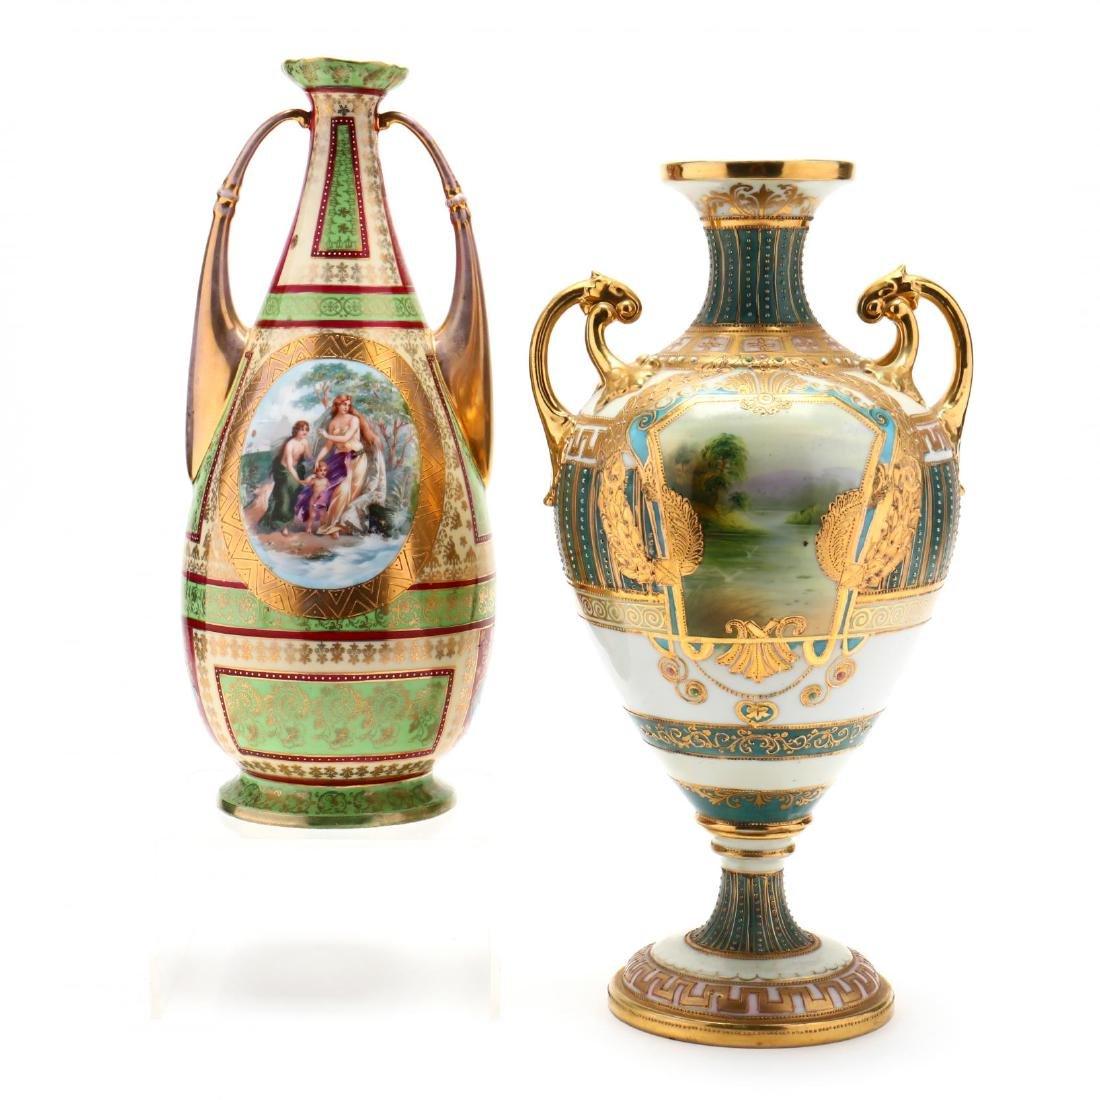 Two Antique Porcelain Vases